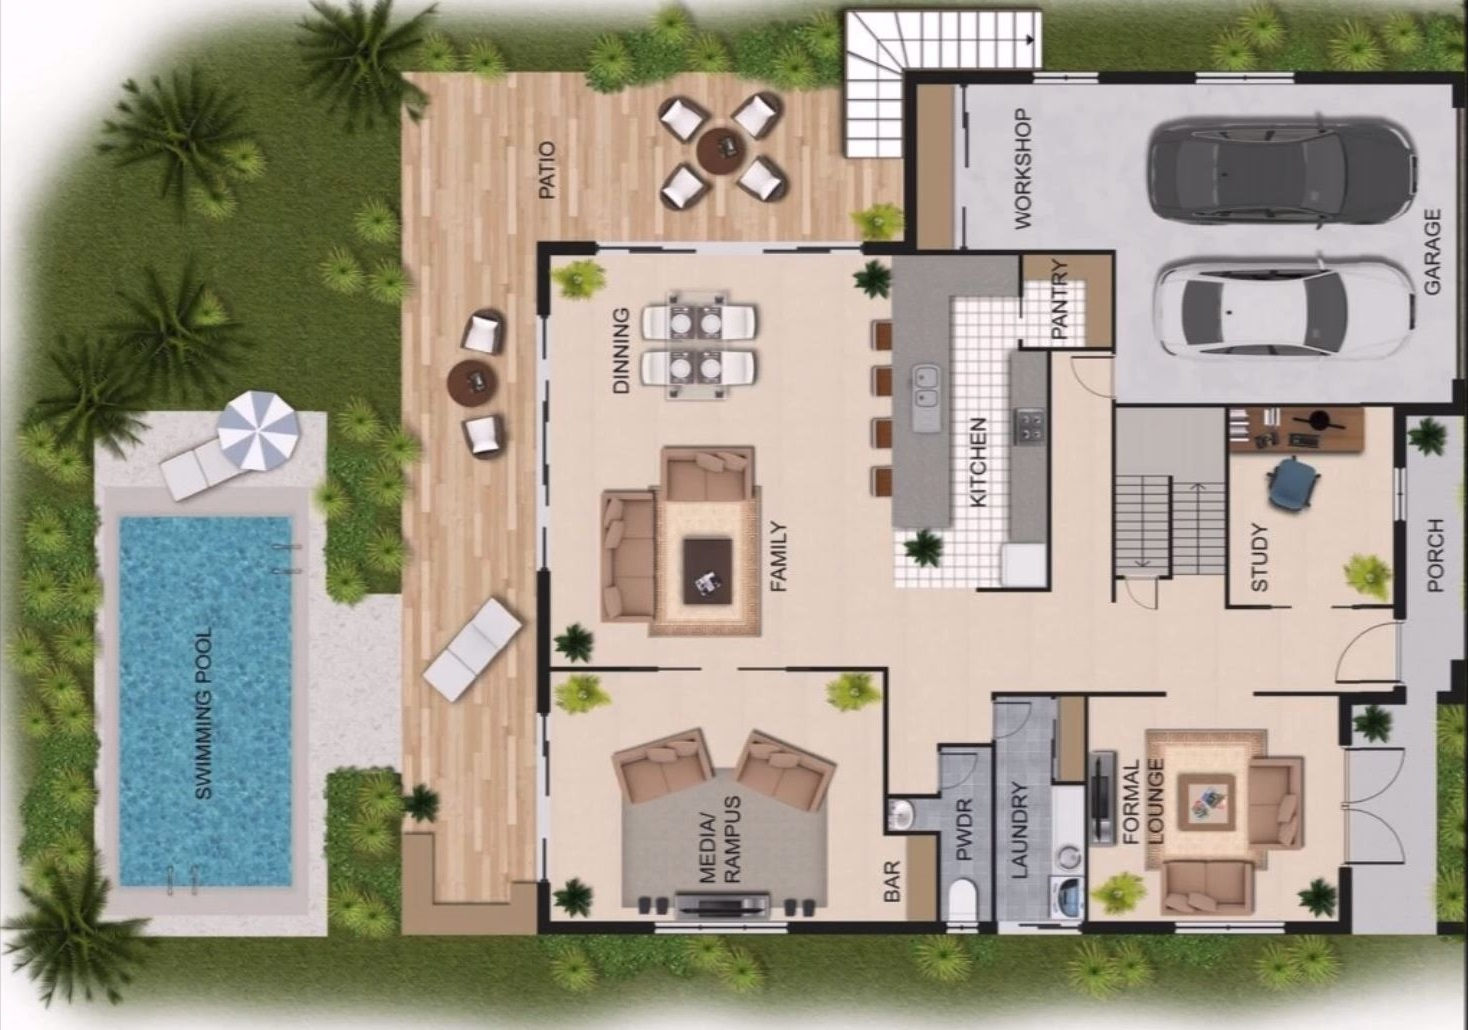 Planos de casas modernas planos de casas gratis y modernas for Casas para herramientas de jardin